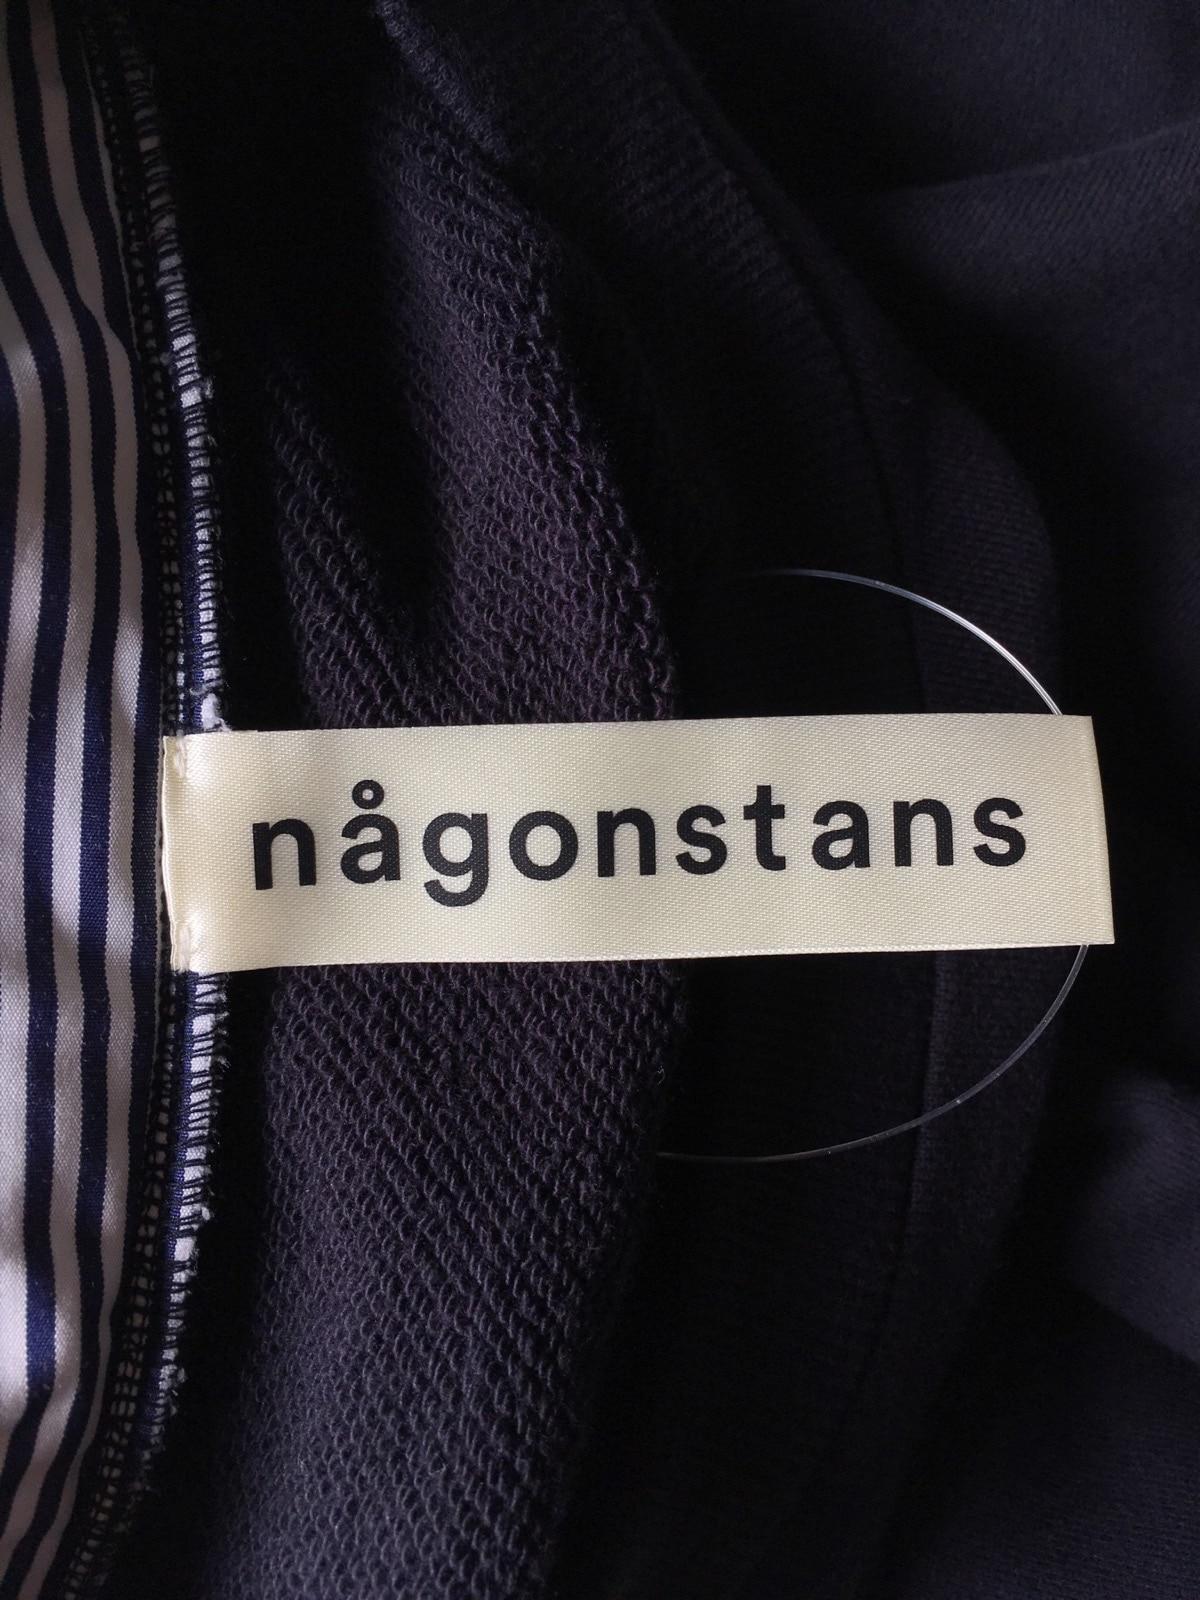 nagonstans(ナゴンスタンス)のトレーナー